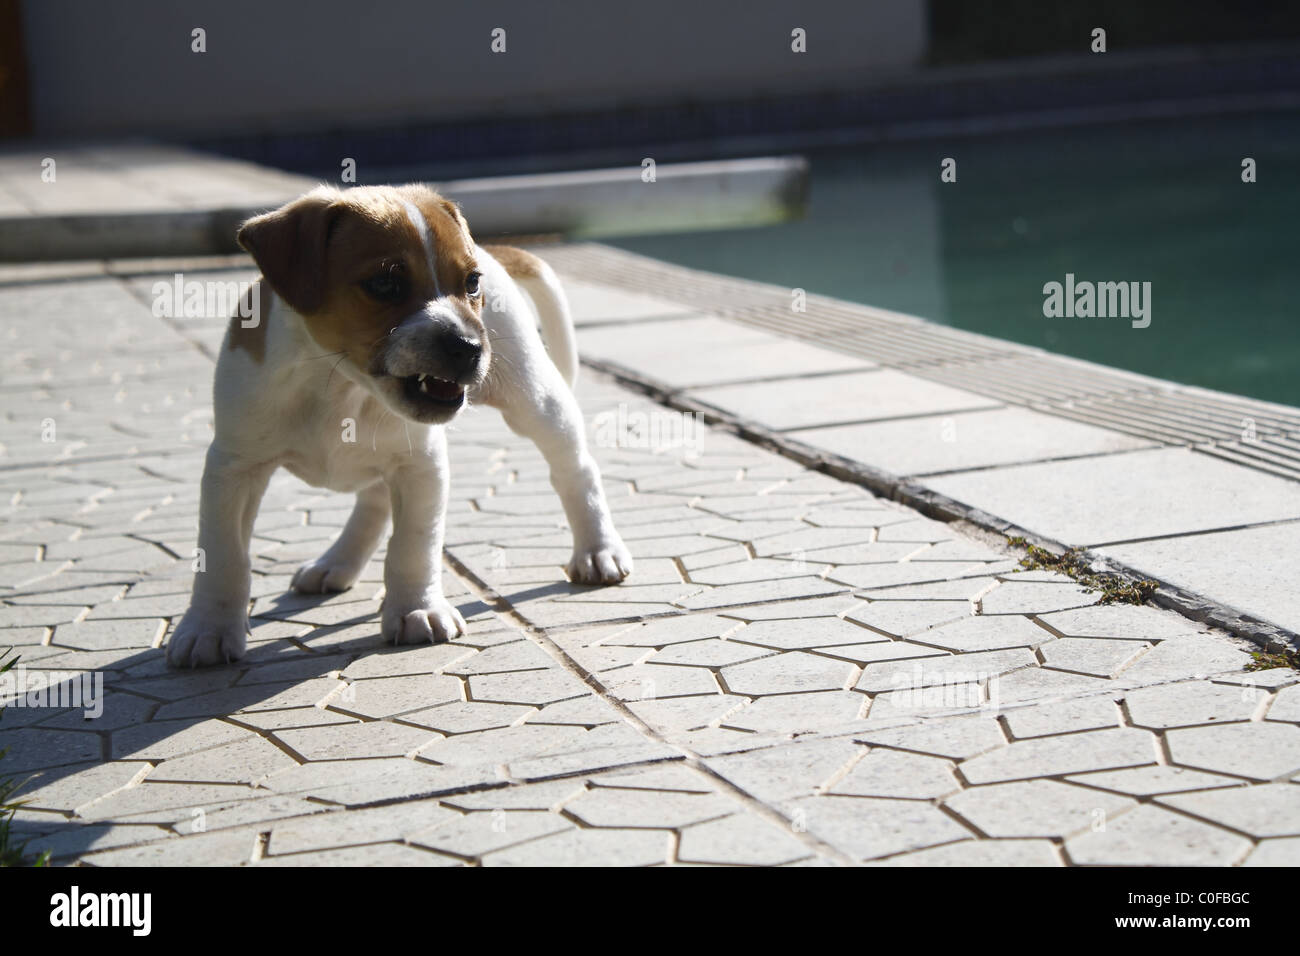 Puppy Growls, portrait Photo:Darryl Putter - Stock Image